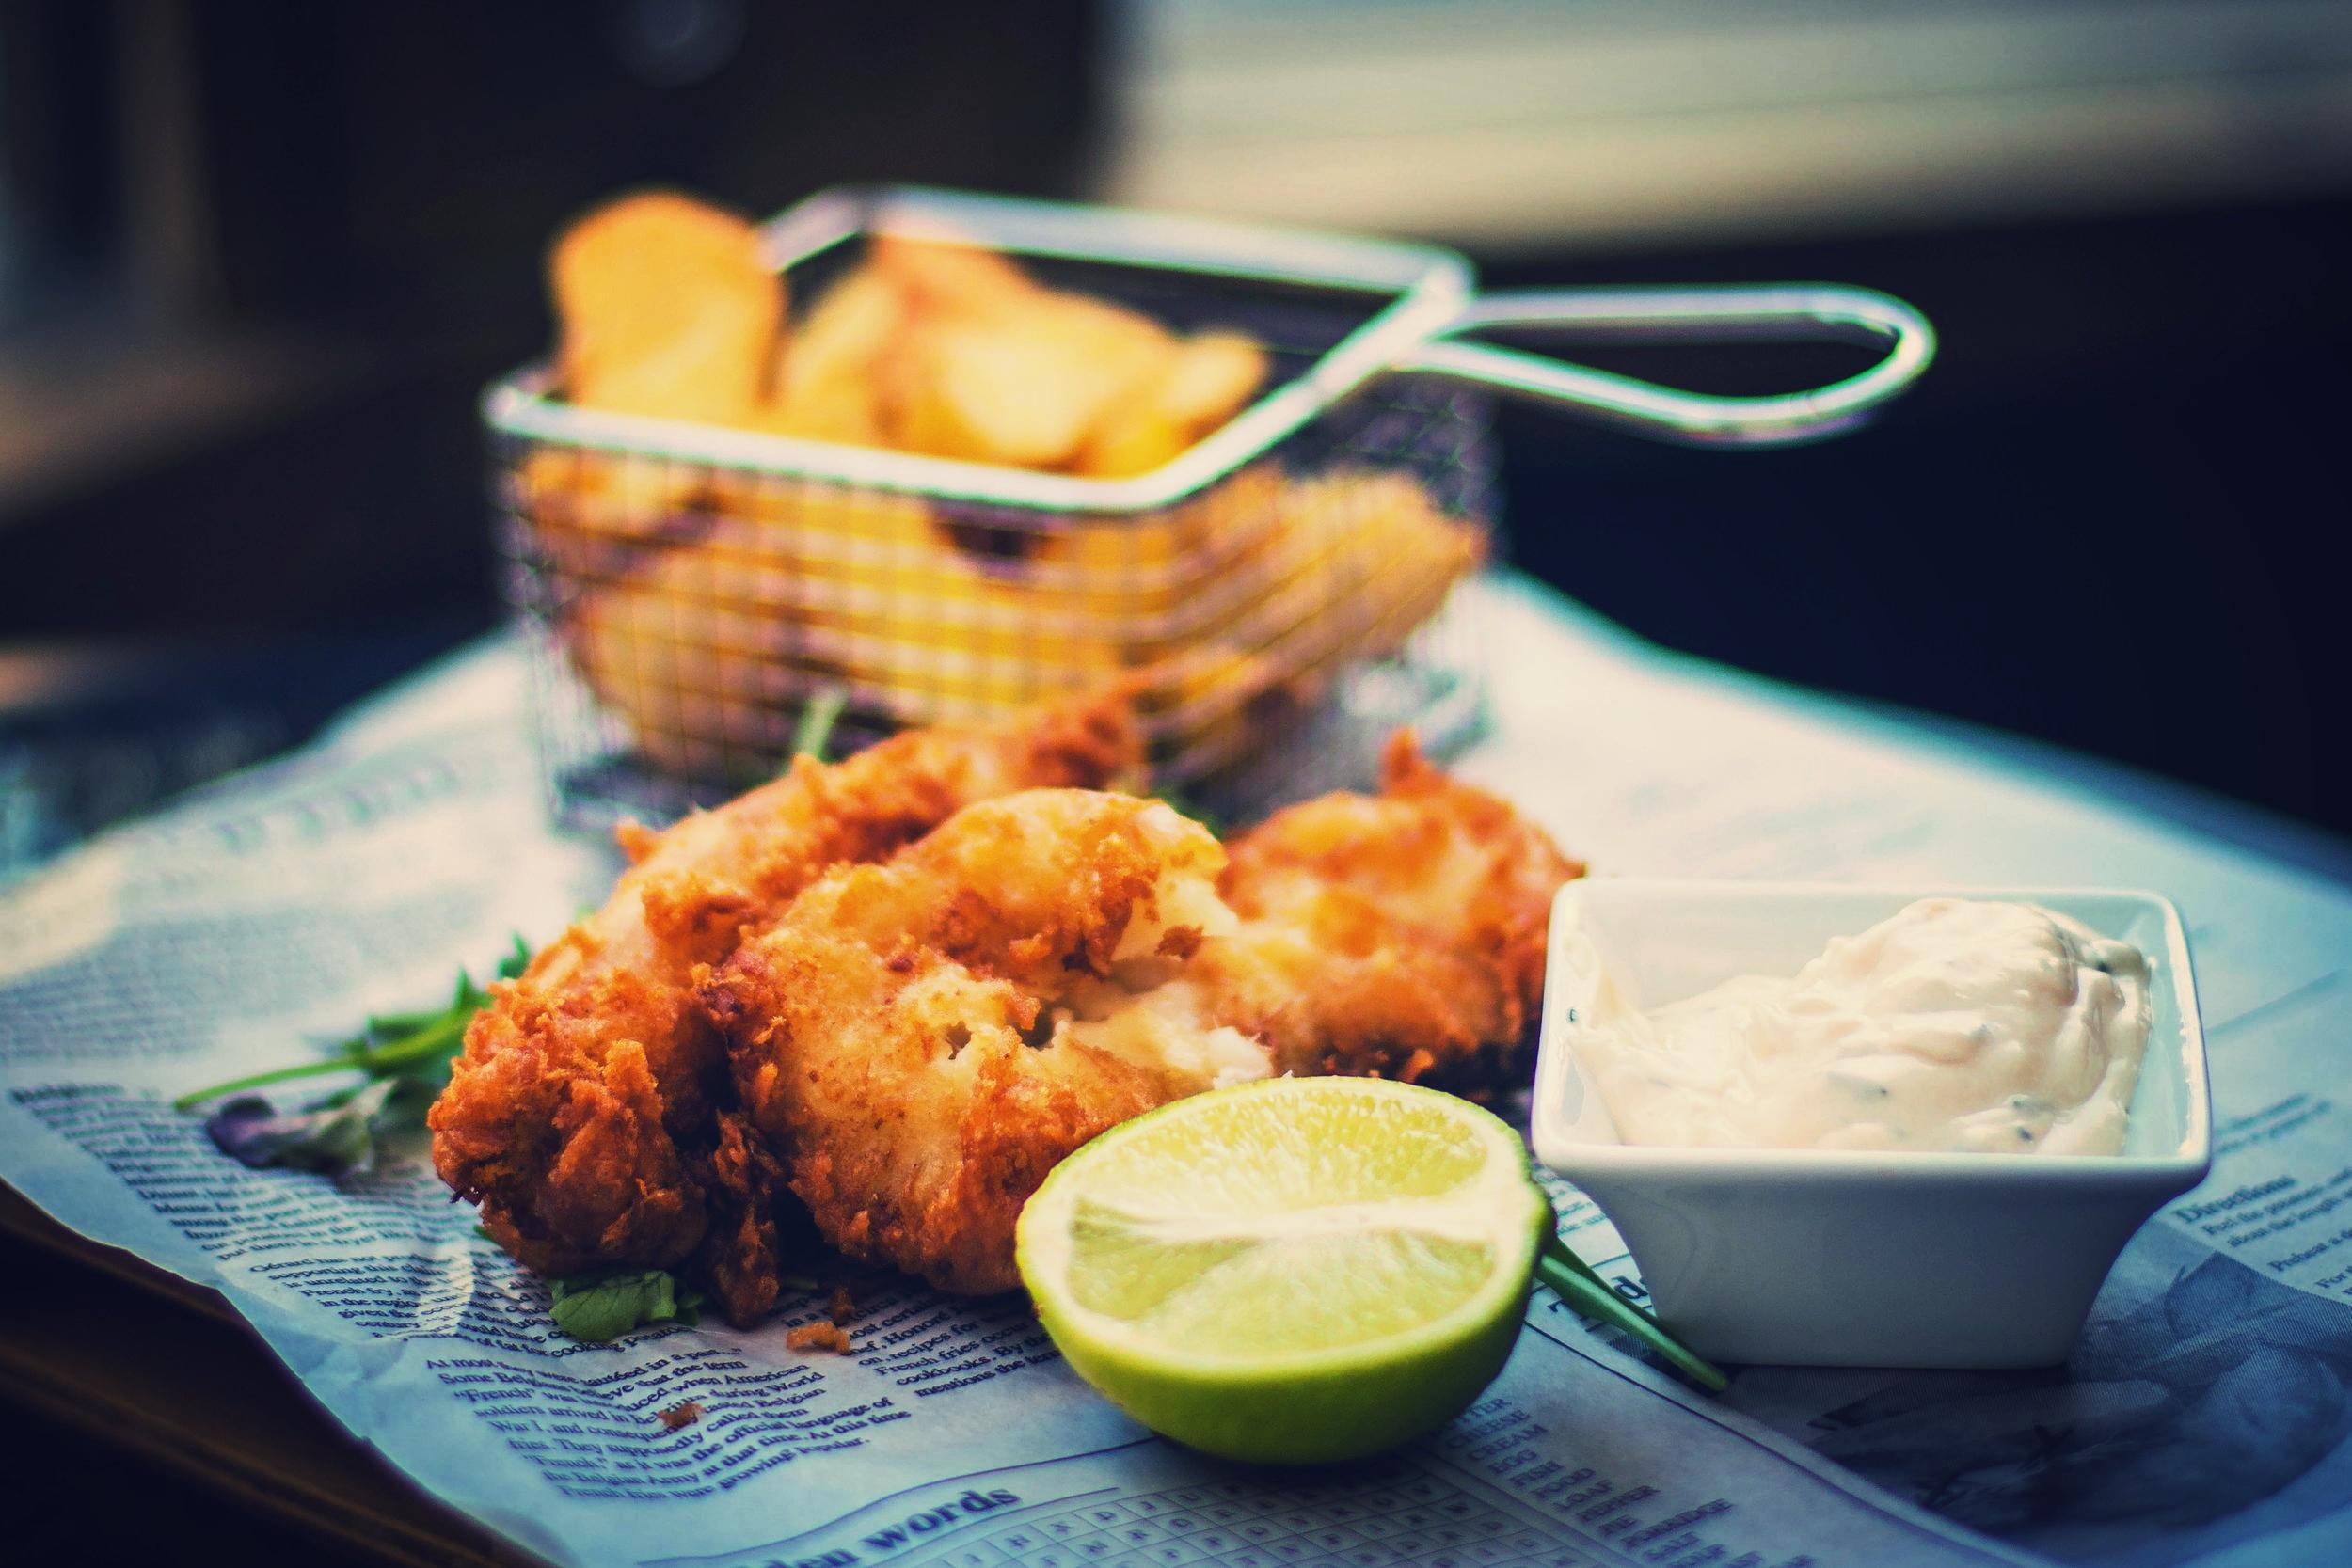 appetizer-chicken-close-up-1123250.jpg